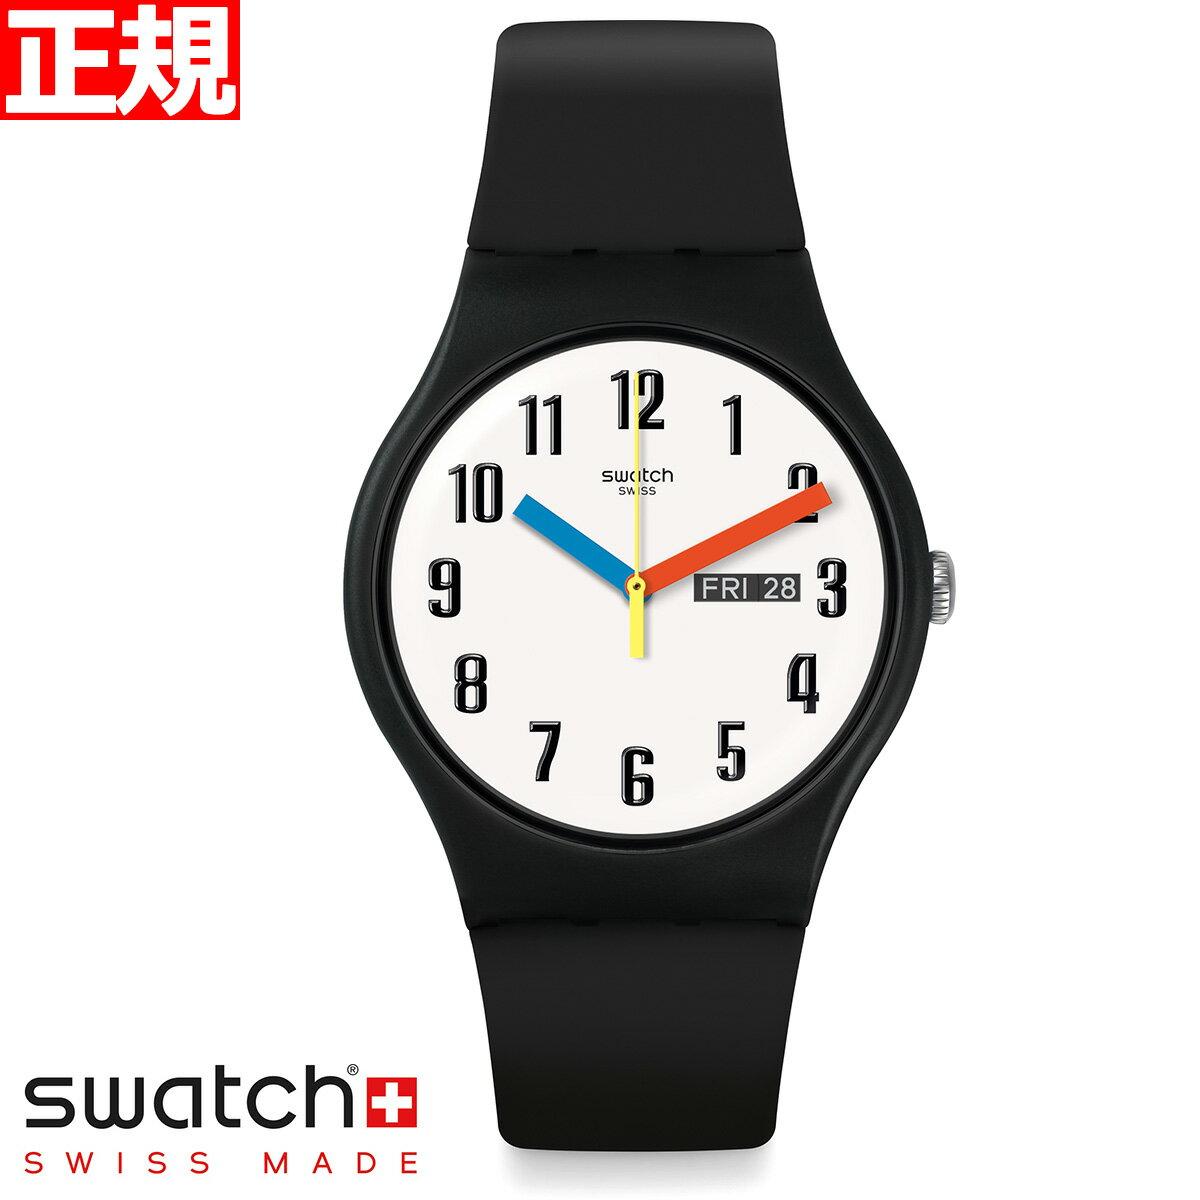 腕時計, 男女兼用腕時計 502000OFF60.552359swatch Originals New Gent ELEMENTARY SUOB728